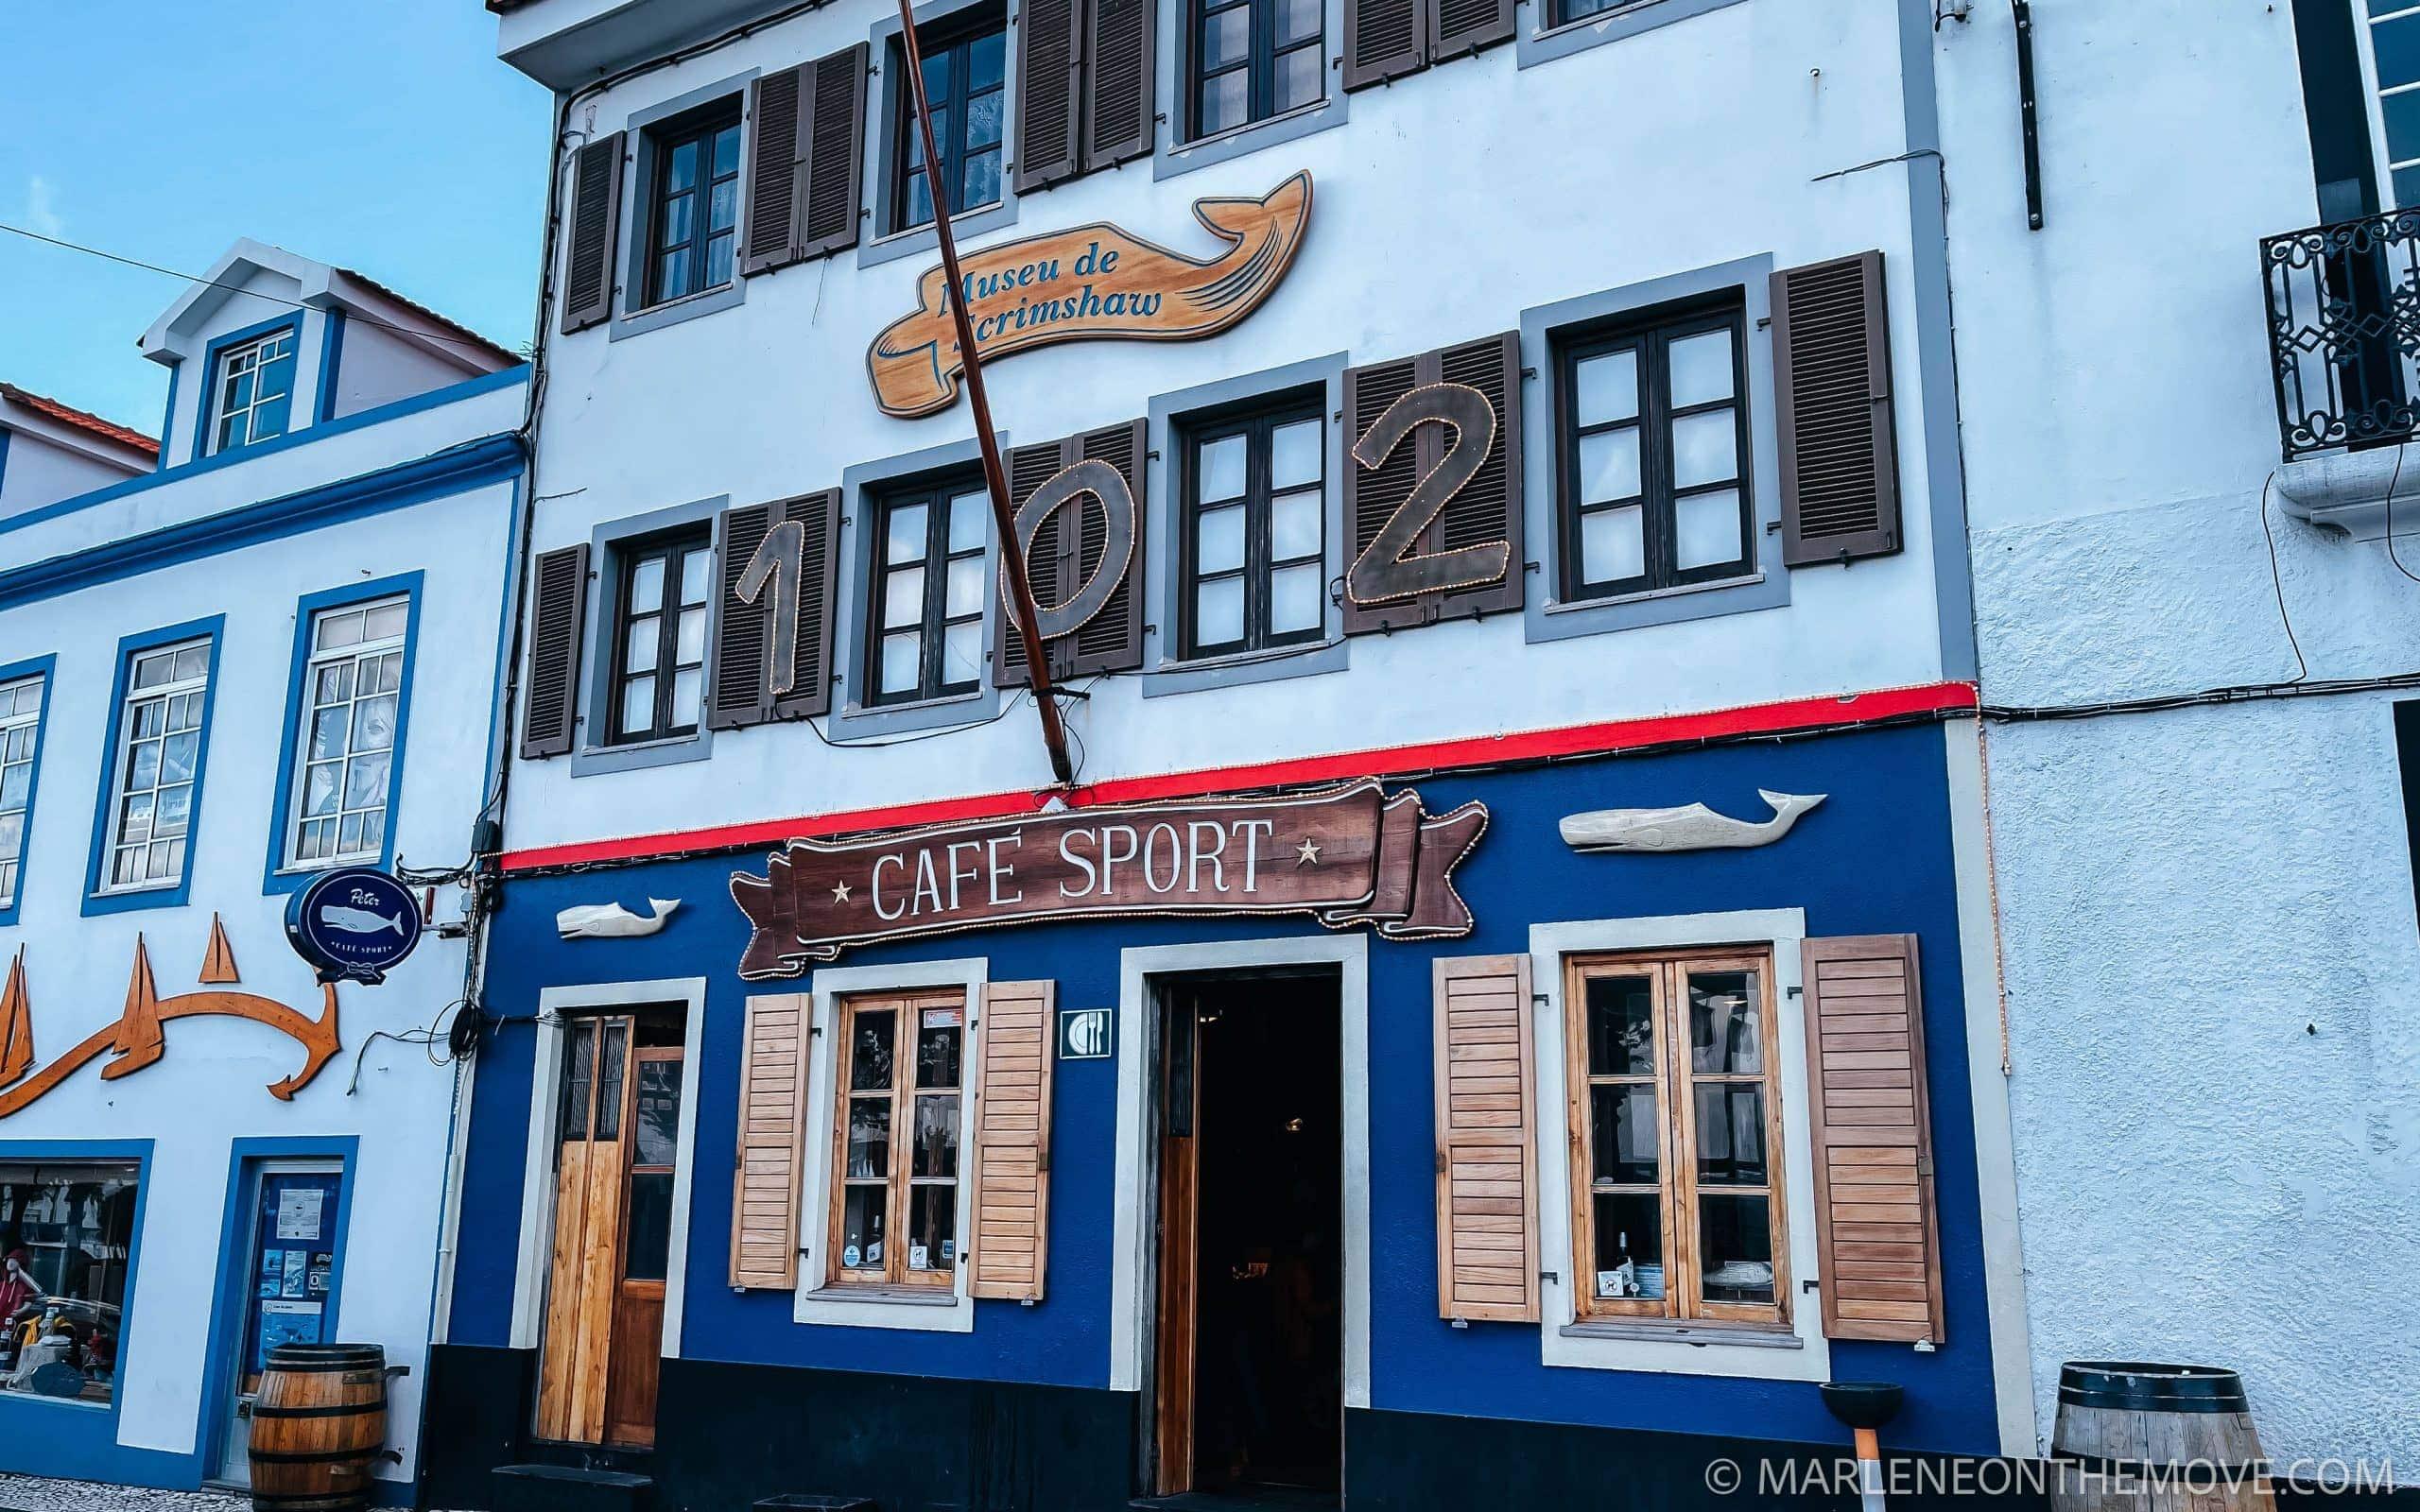 Peter's Cafe Sport Faial Azores